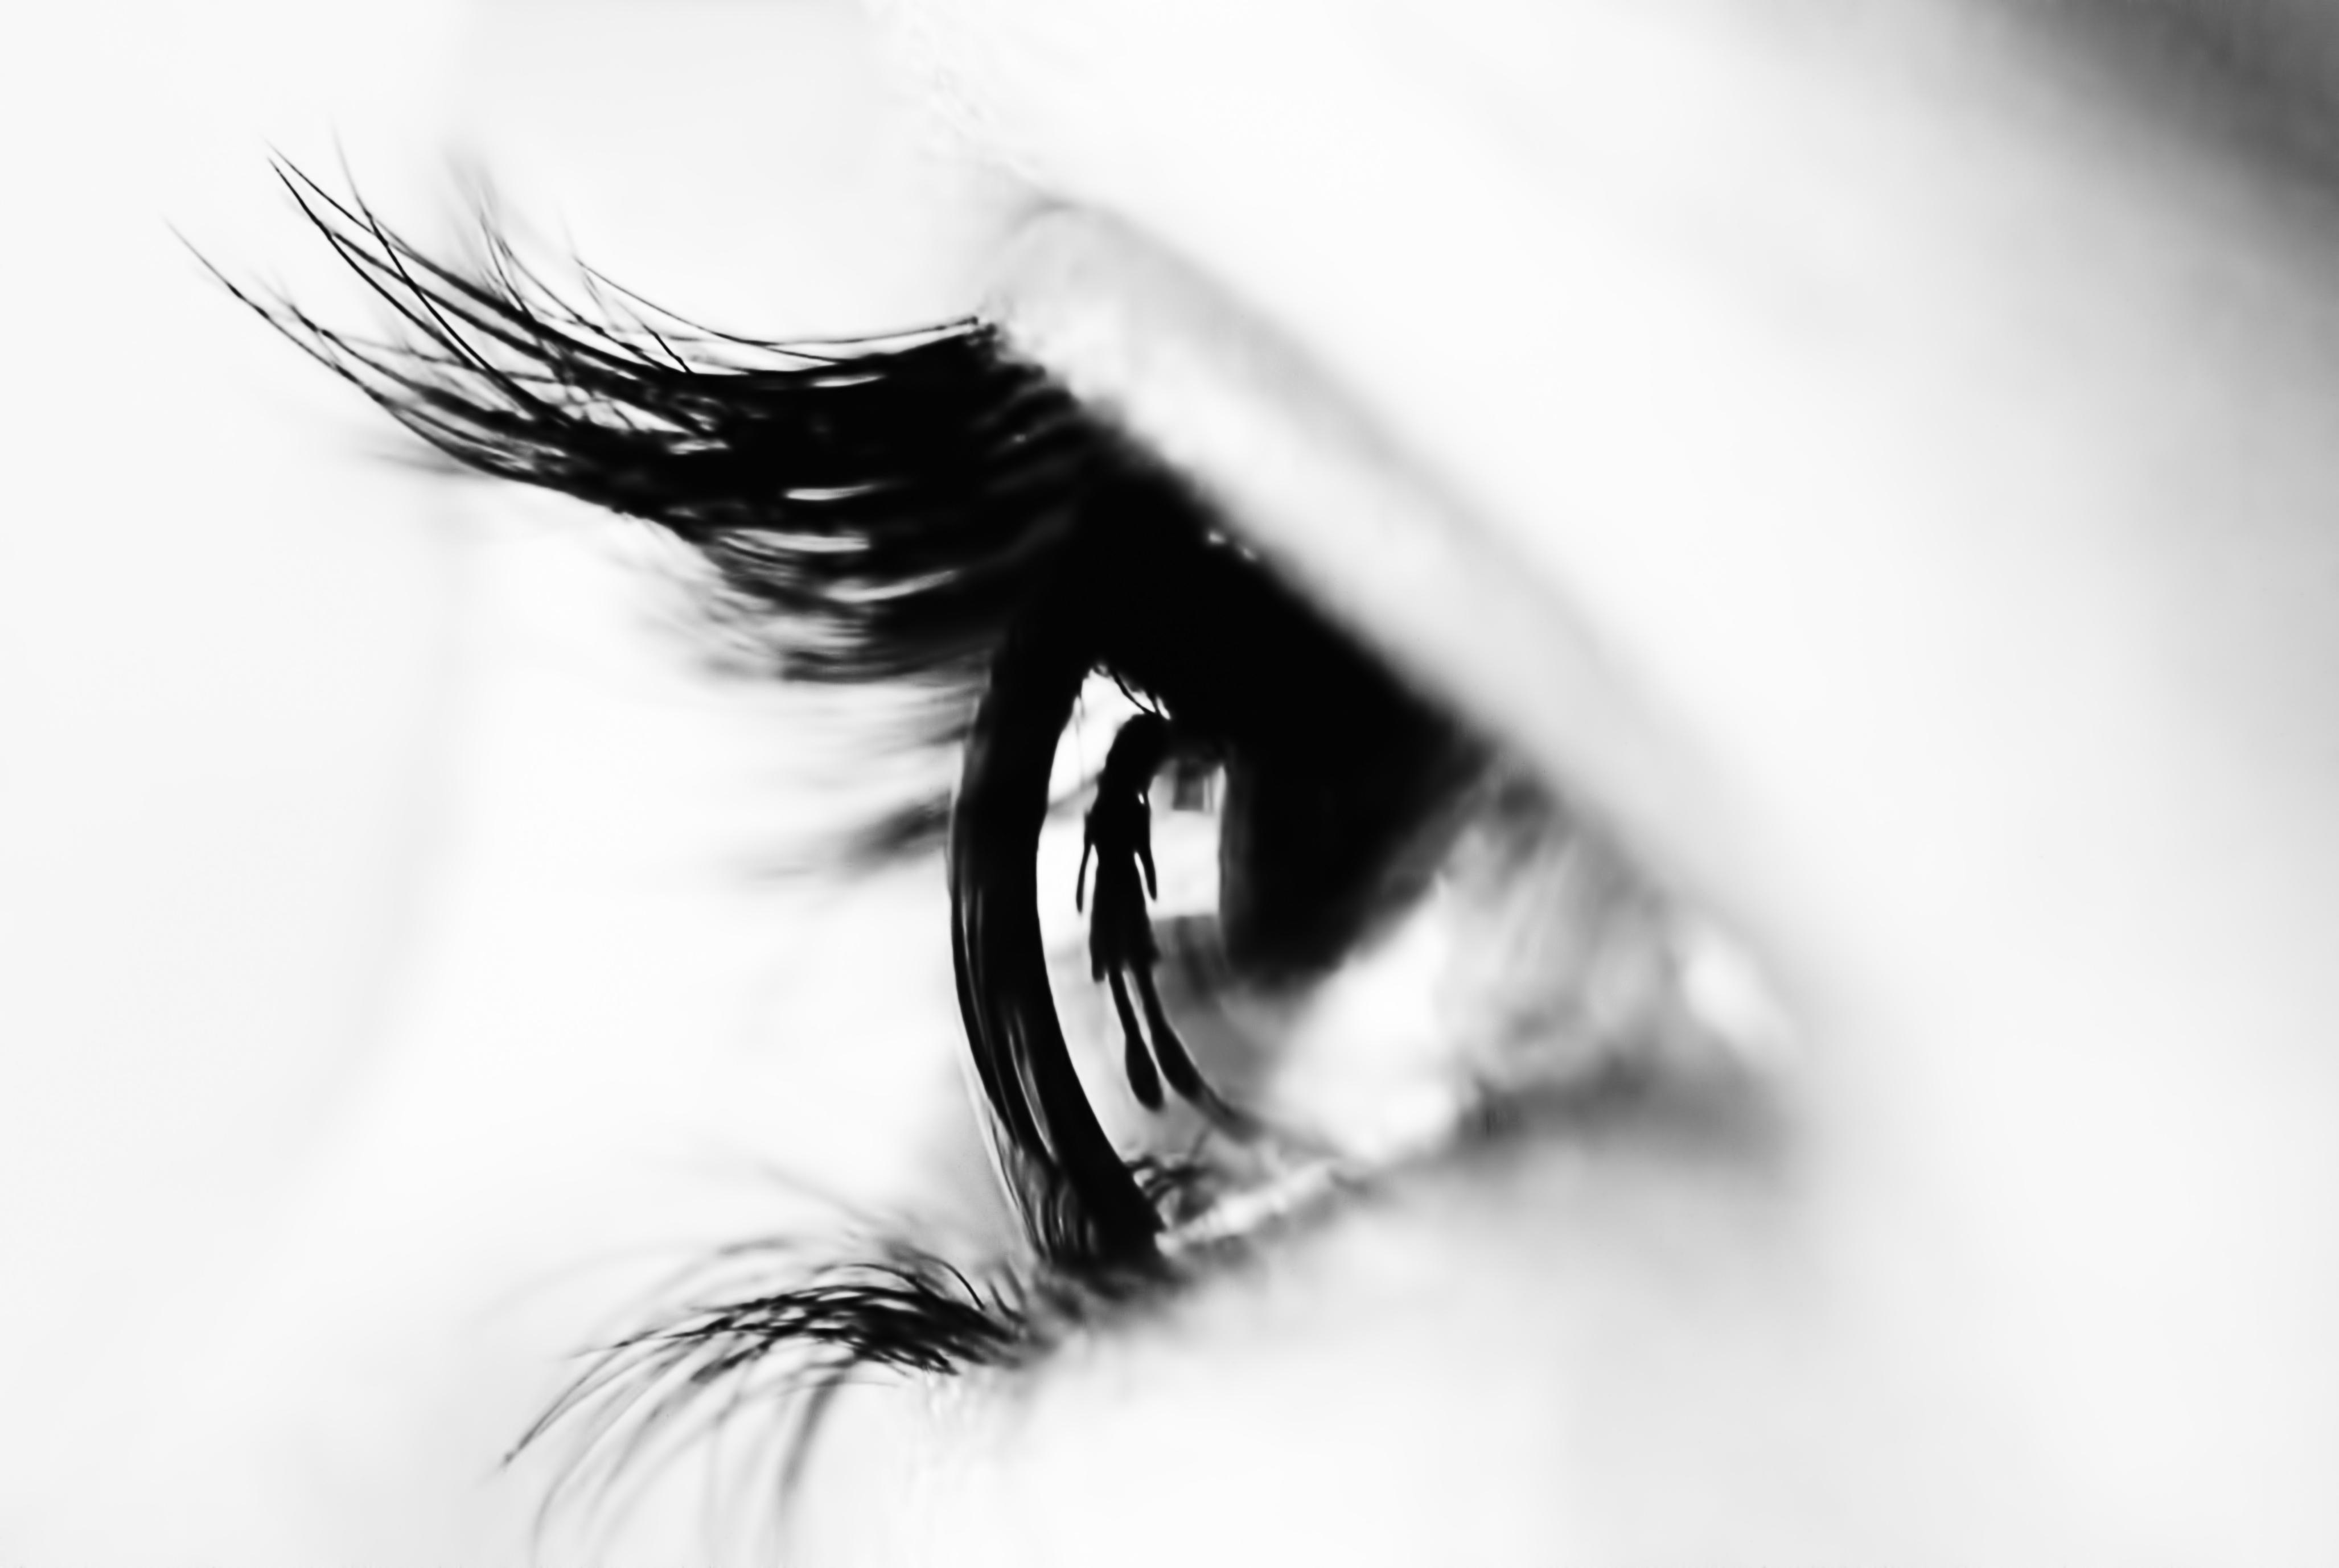 visuelle neuroprotektor endocannabinoidsystem